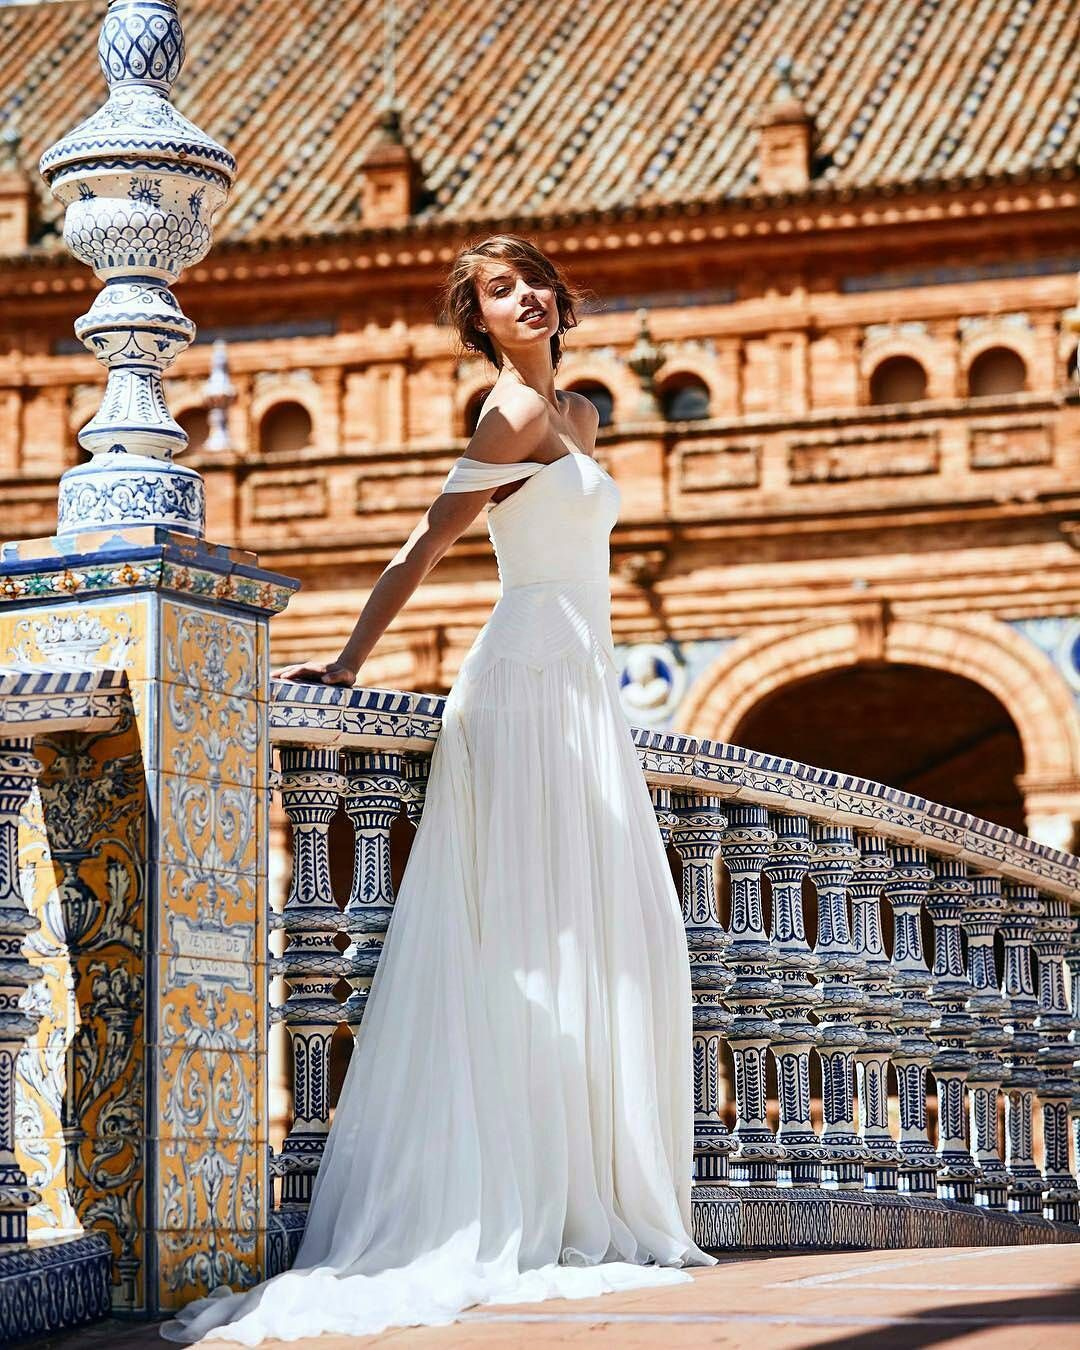 Spring whites.  Bold bridal perfection in Seville's Plaza de España featuring RABAT dress by @pronovias  Photos @darioaranyo  Hair & Makeup @aranyito  http://gelinshop.com/ipost/1521779475942458125/?code=BUecl7iB8MN